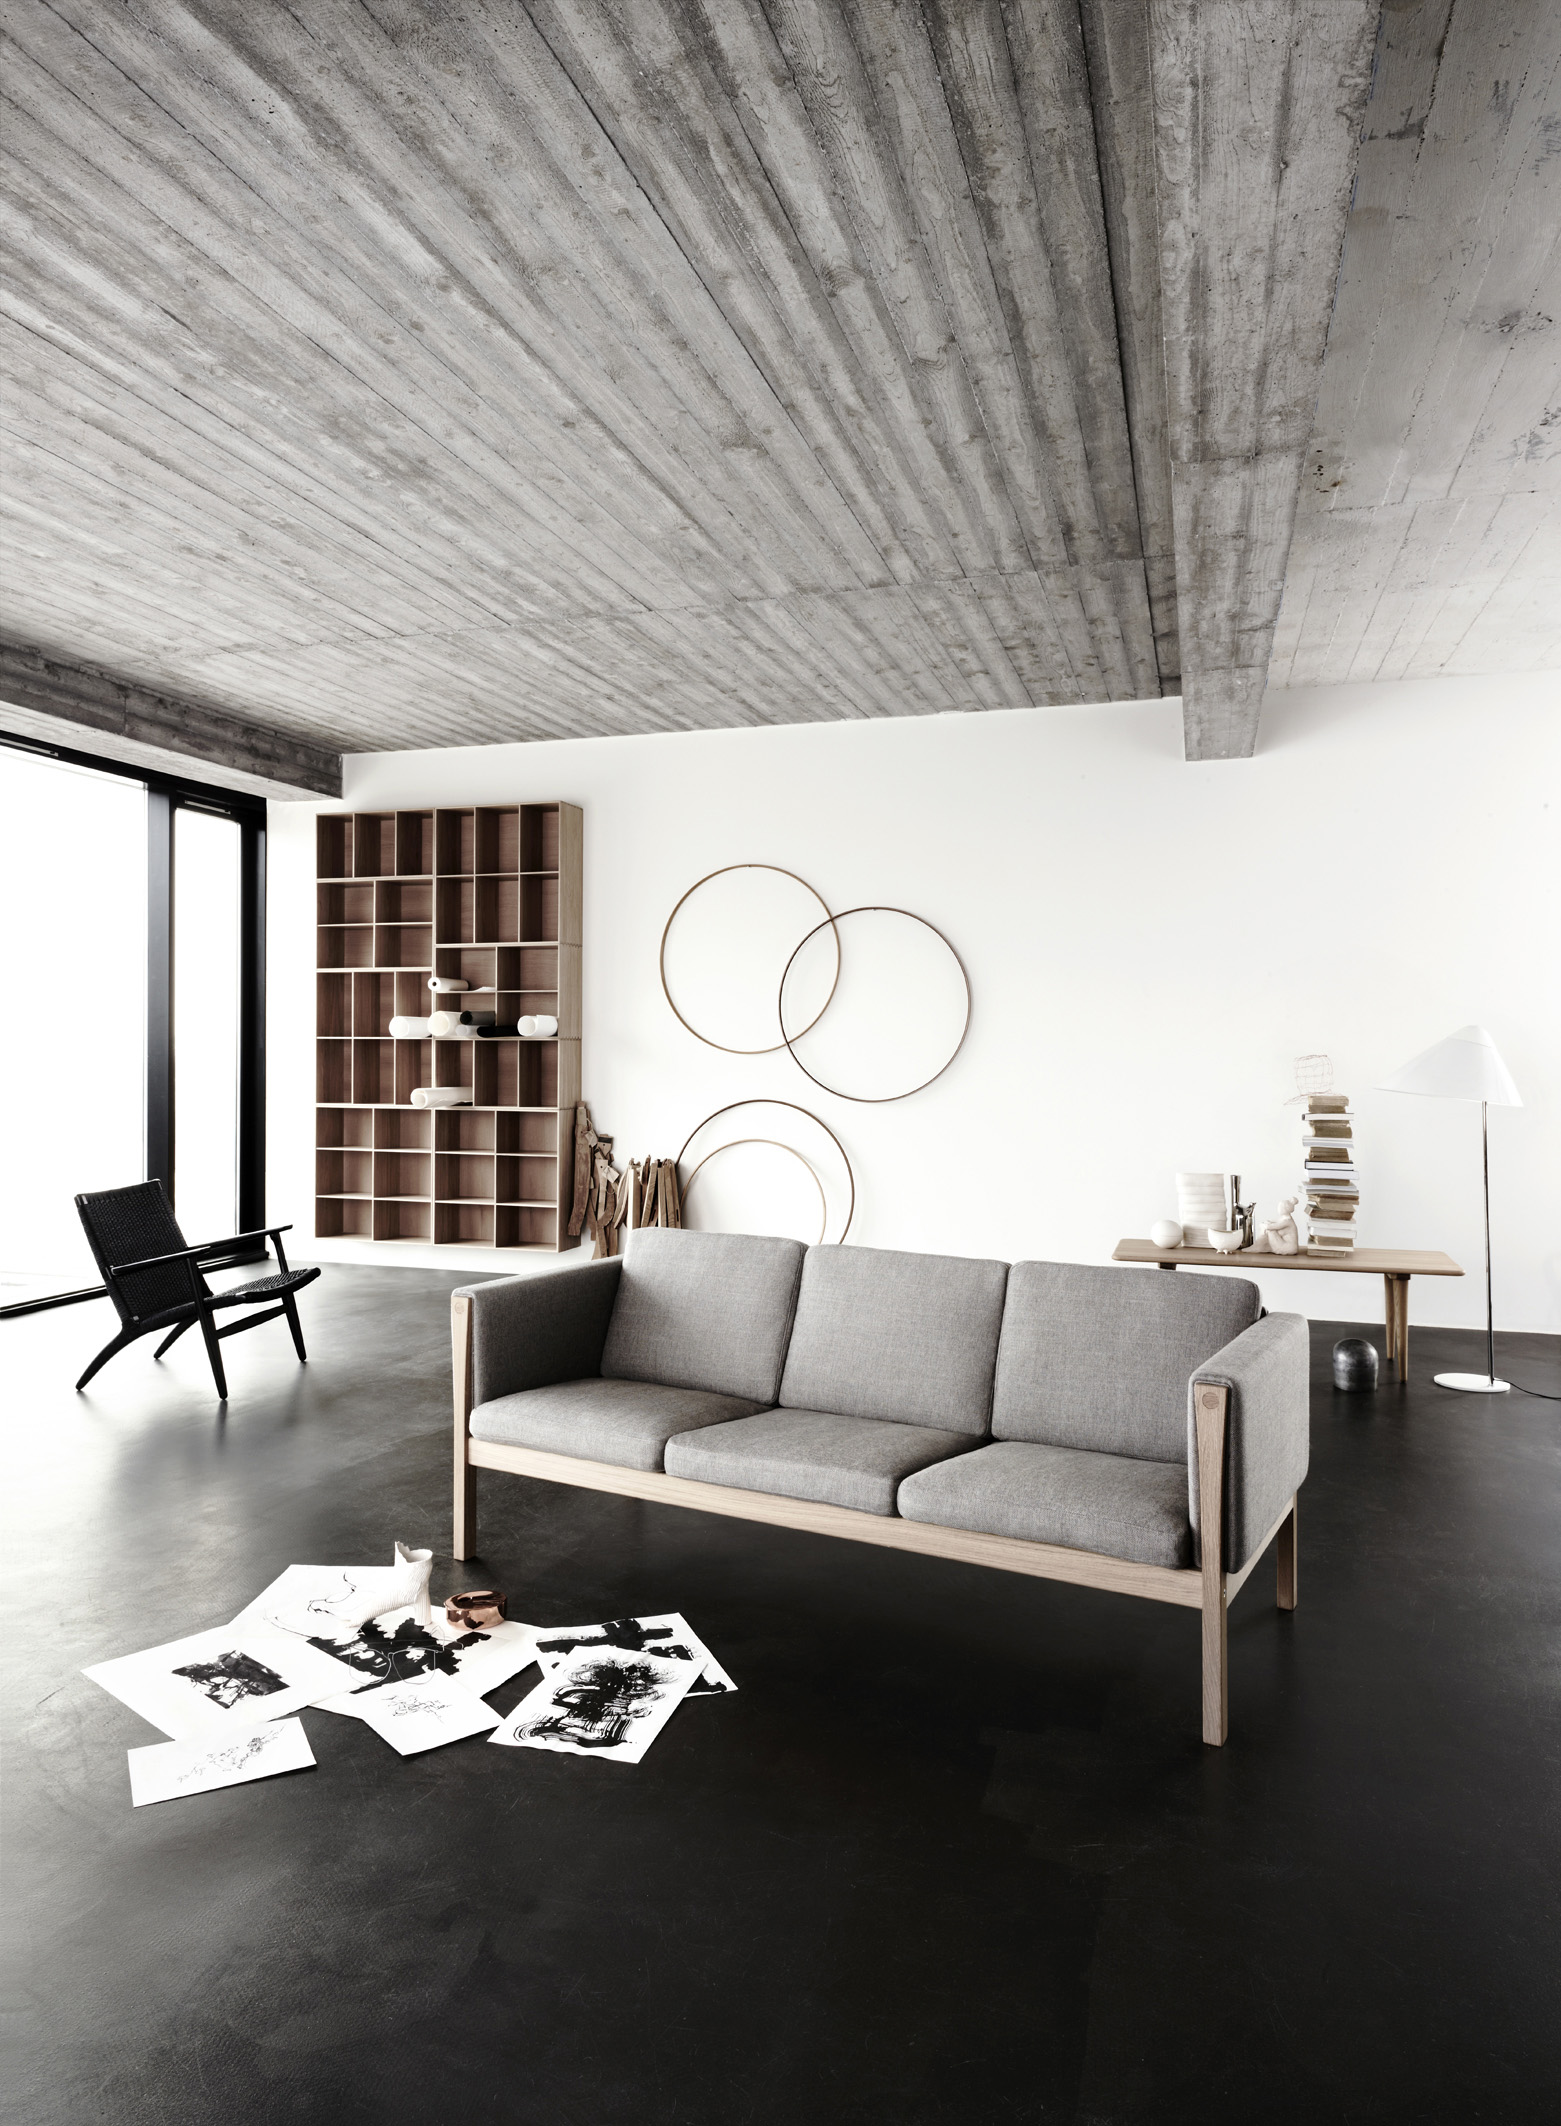 carl hansen son sofas ch162 and ch163. Black Bedroom Furniture Sets. Home Design Ideas